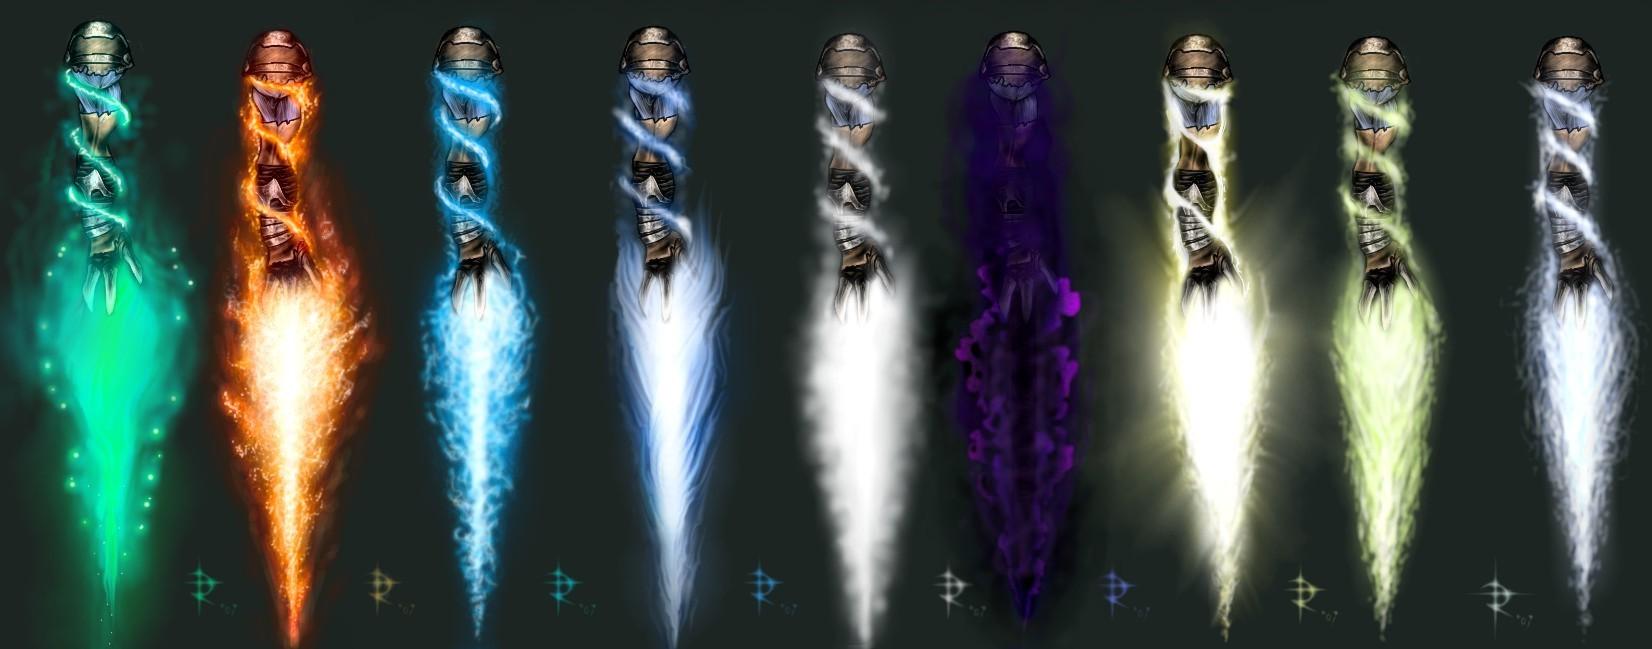 http://www.gamer.ru/system/attached_images/images/000/686/600/original/664454-raziel_elemental_reavers_by_tetsugem28.jpg